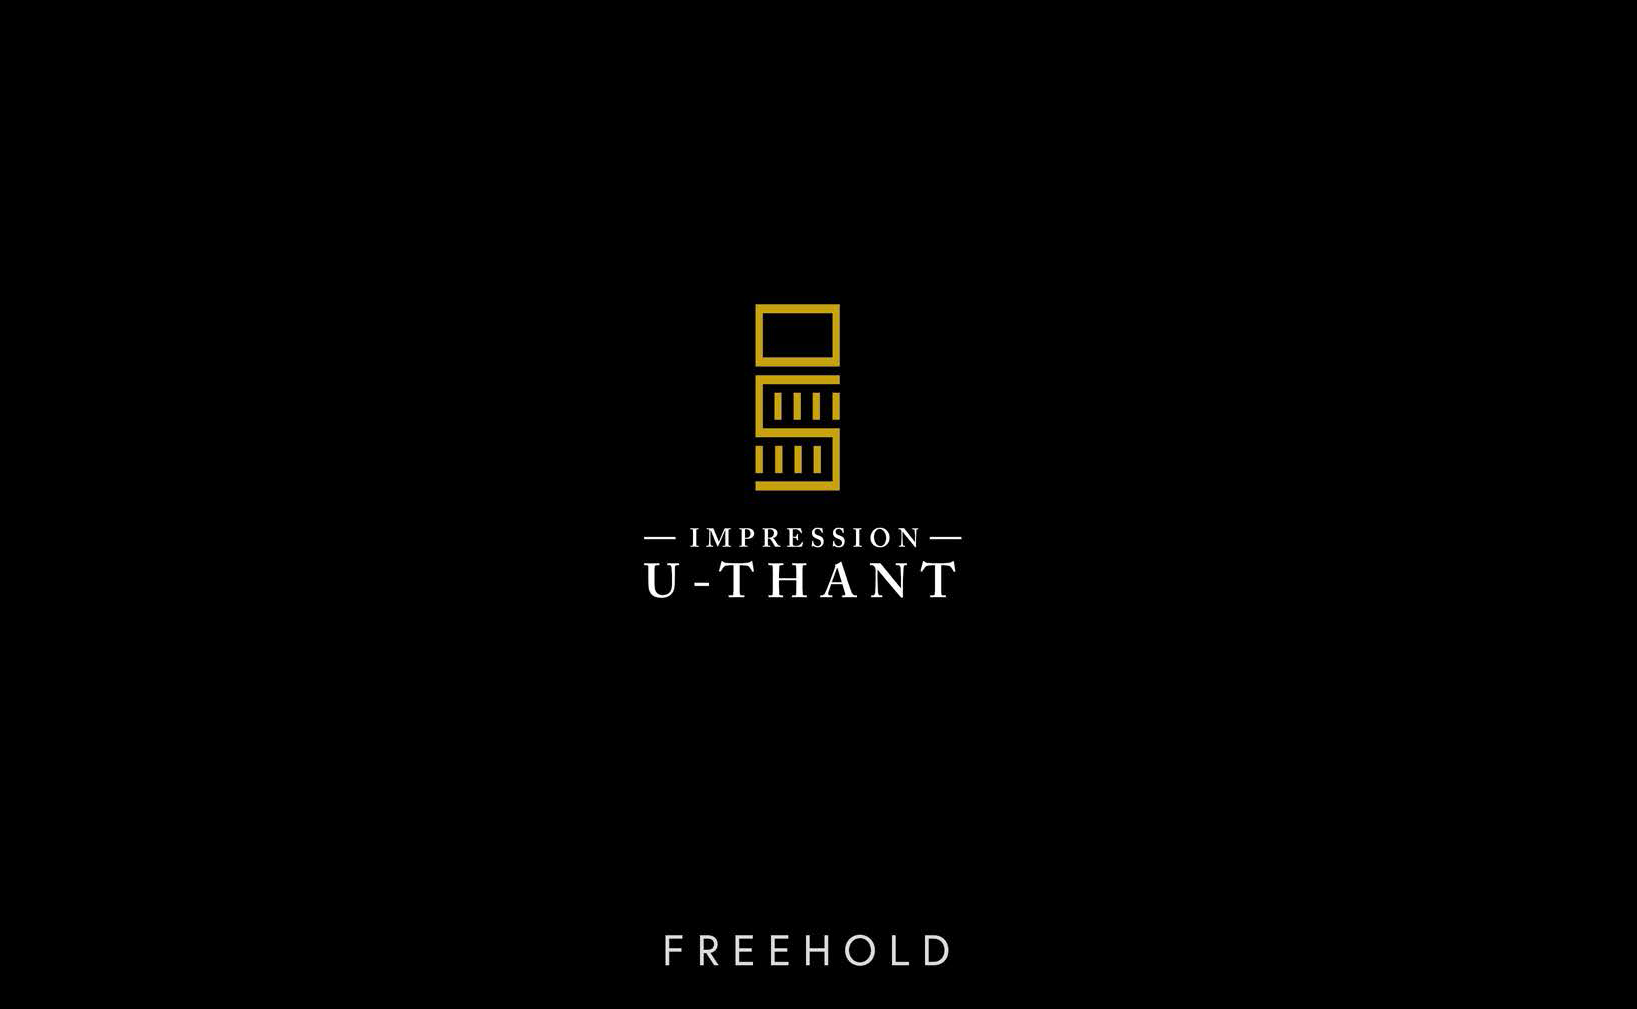 Impression U-Thant